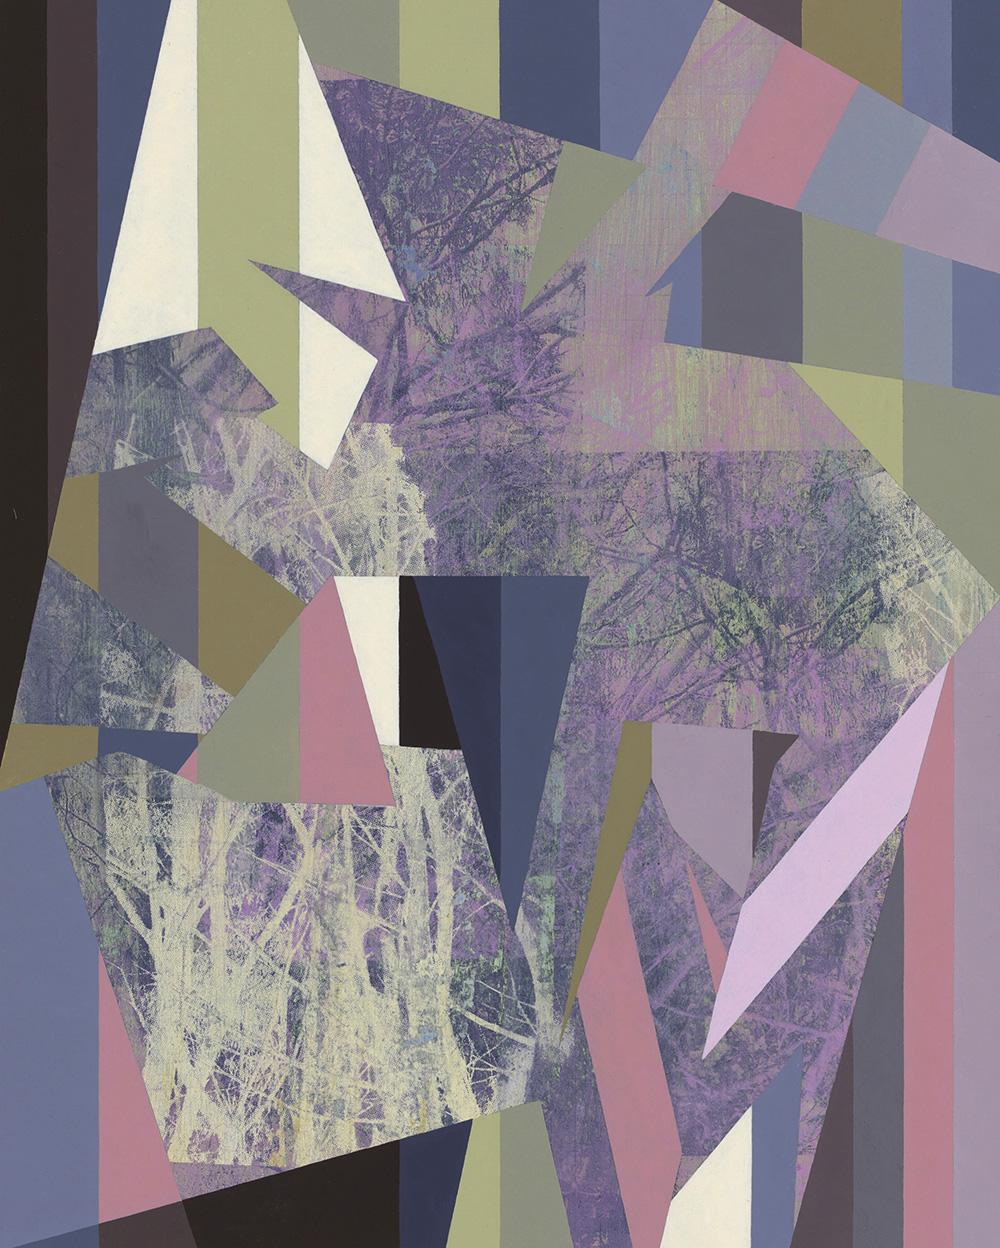 Claire Mooney Abstract Art Splinter 2020